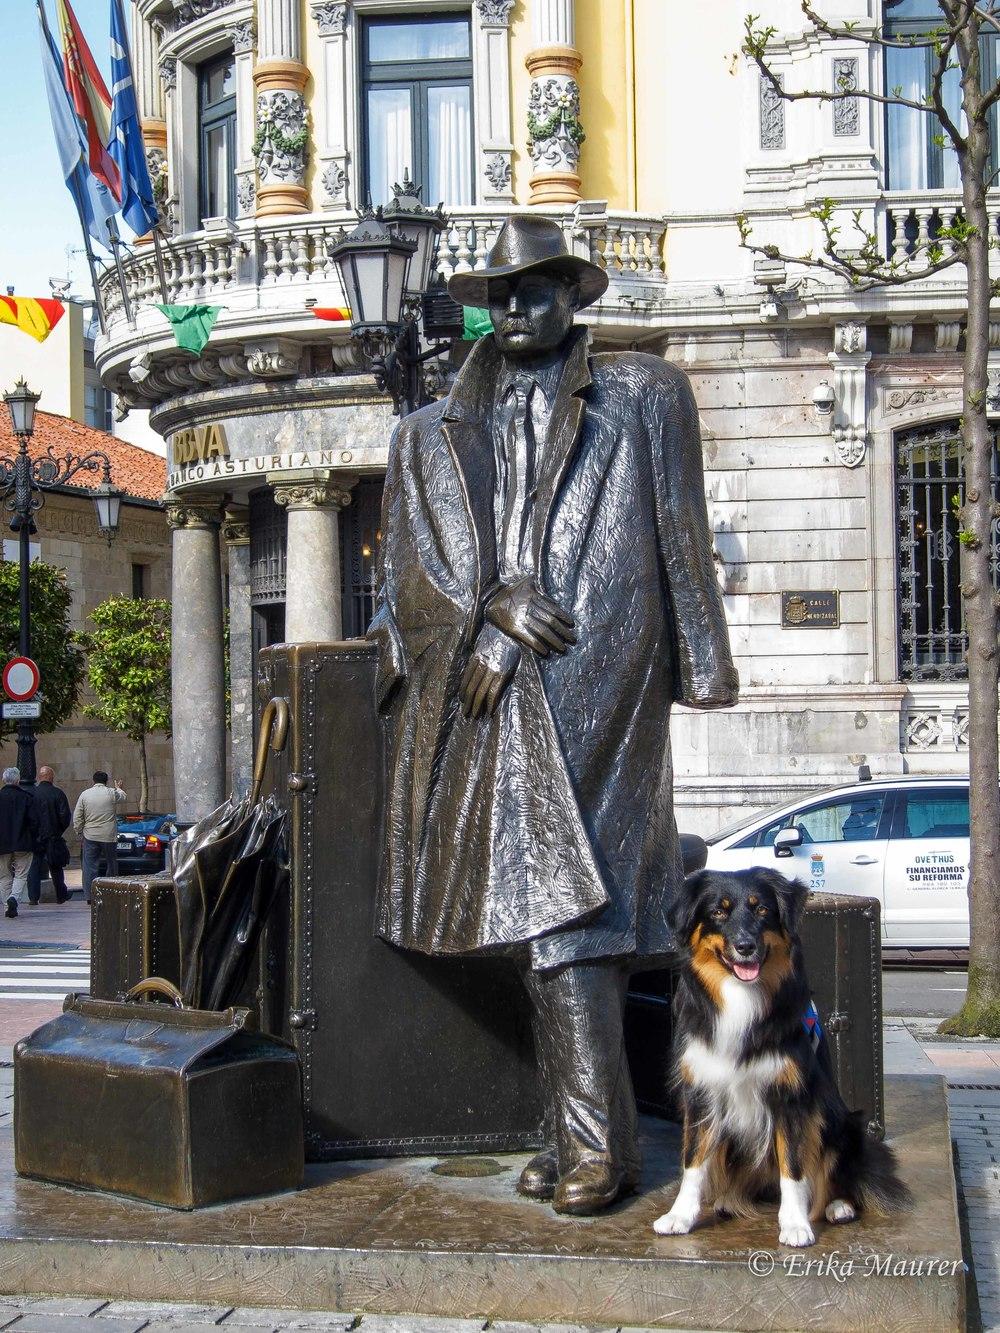 Oviedo, Spain - May 2013